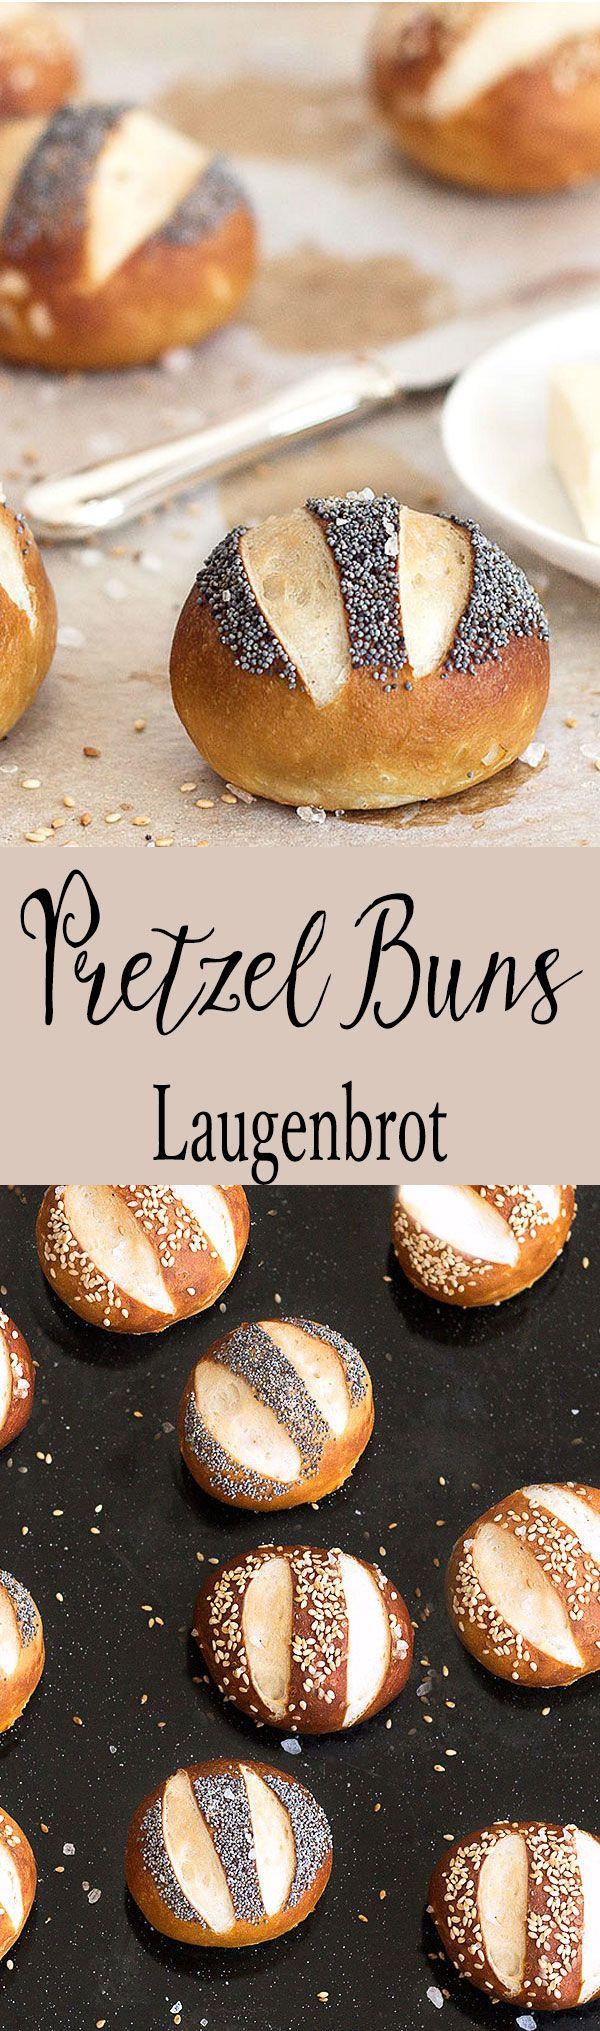 Pretzel Buns - Serve them as dinner rolls or use them as burger buns!